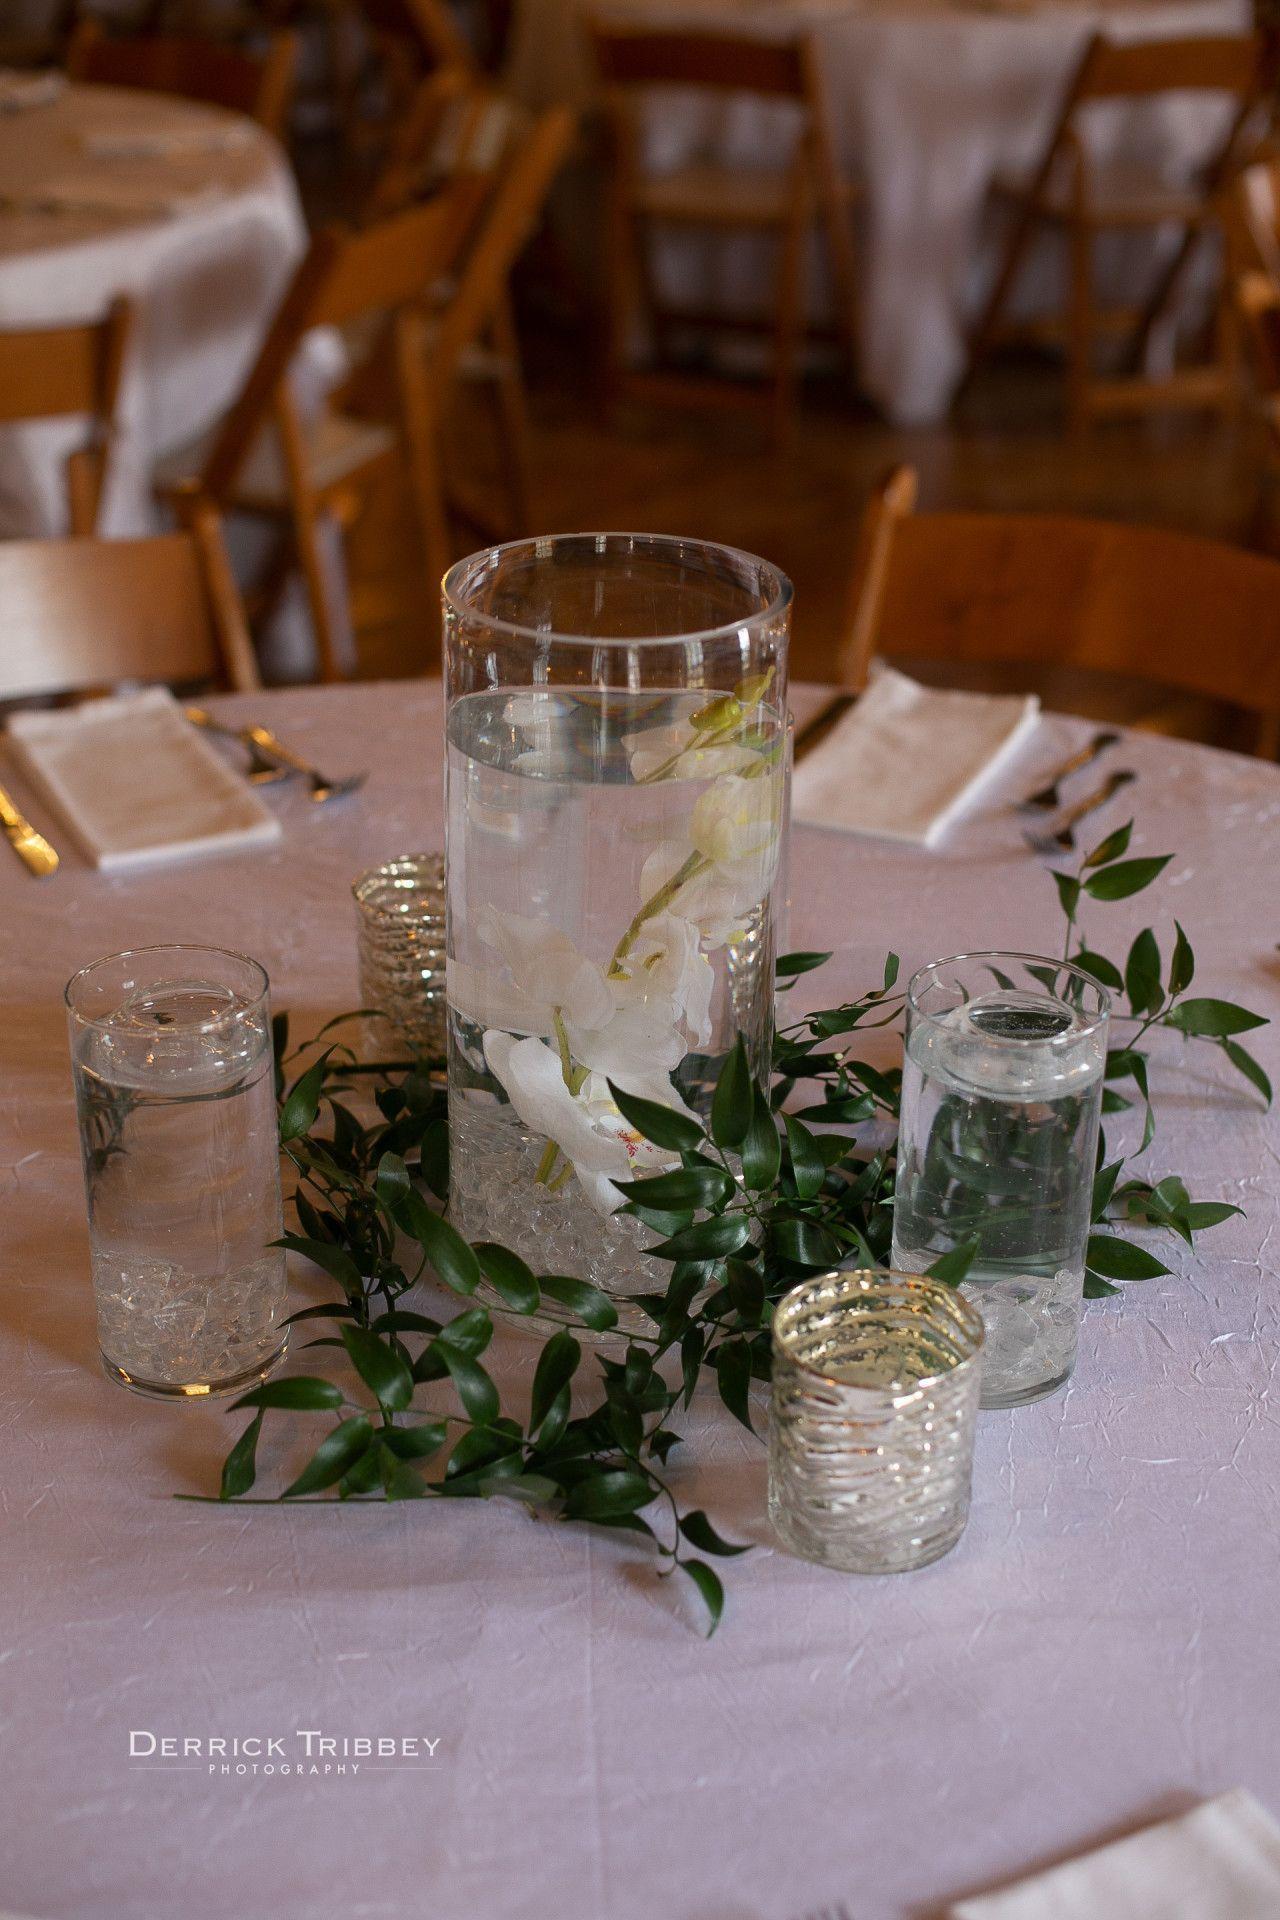 Diy wedding table decorations ideas  DIY wedding centerpiece  floating flower wedding centerpiece